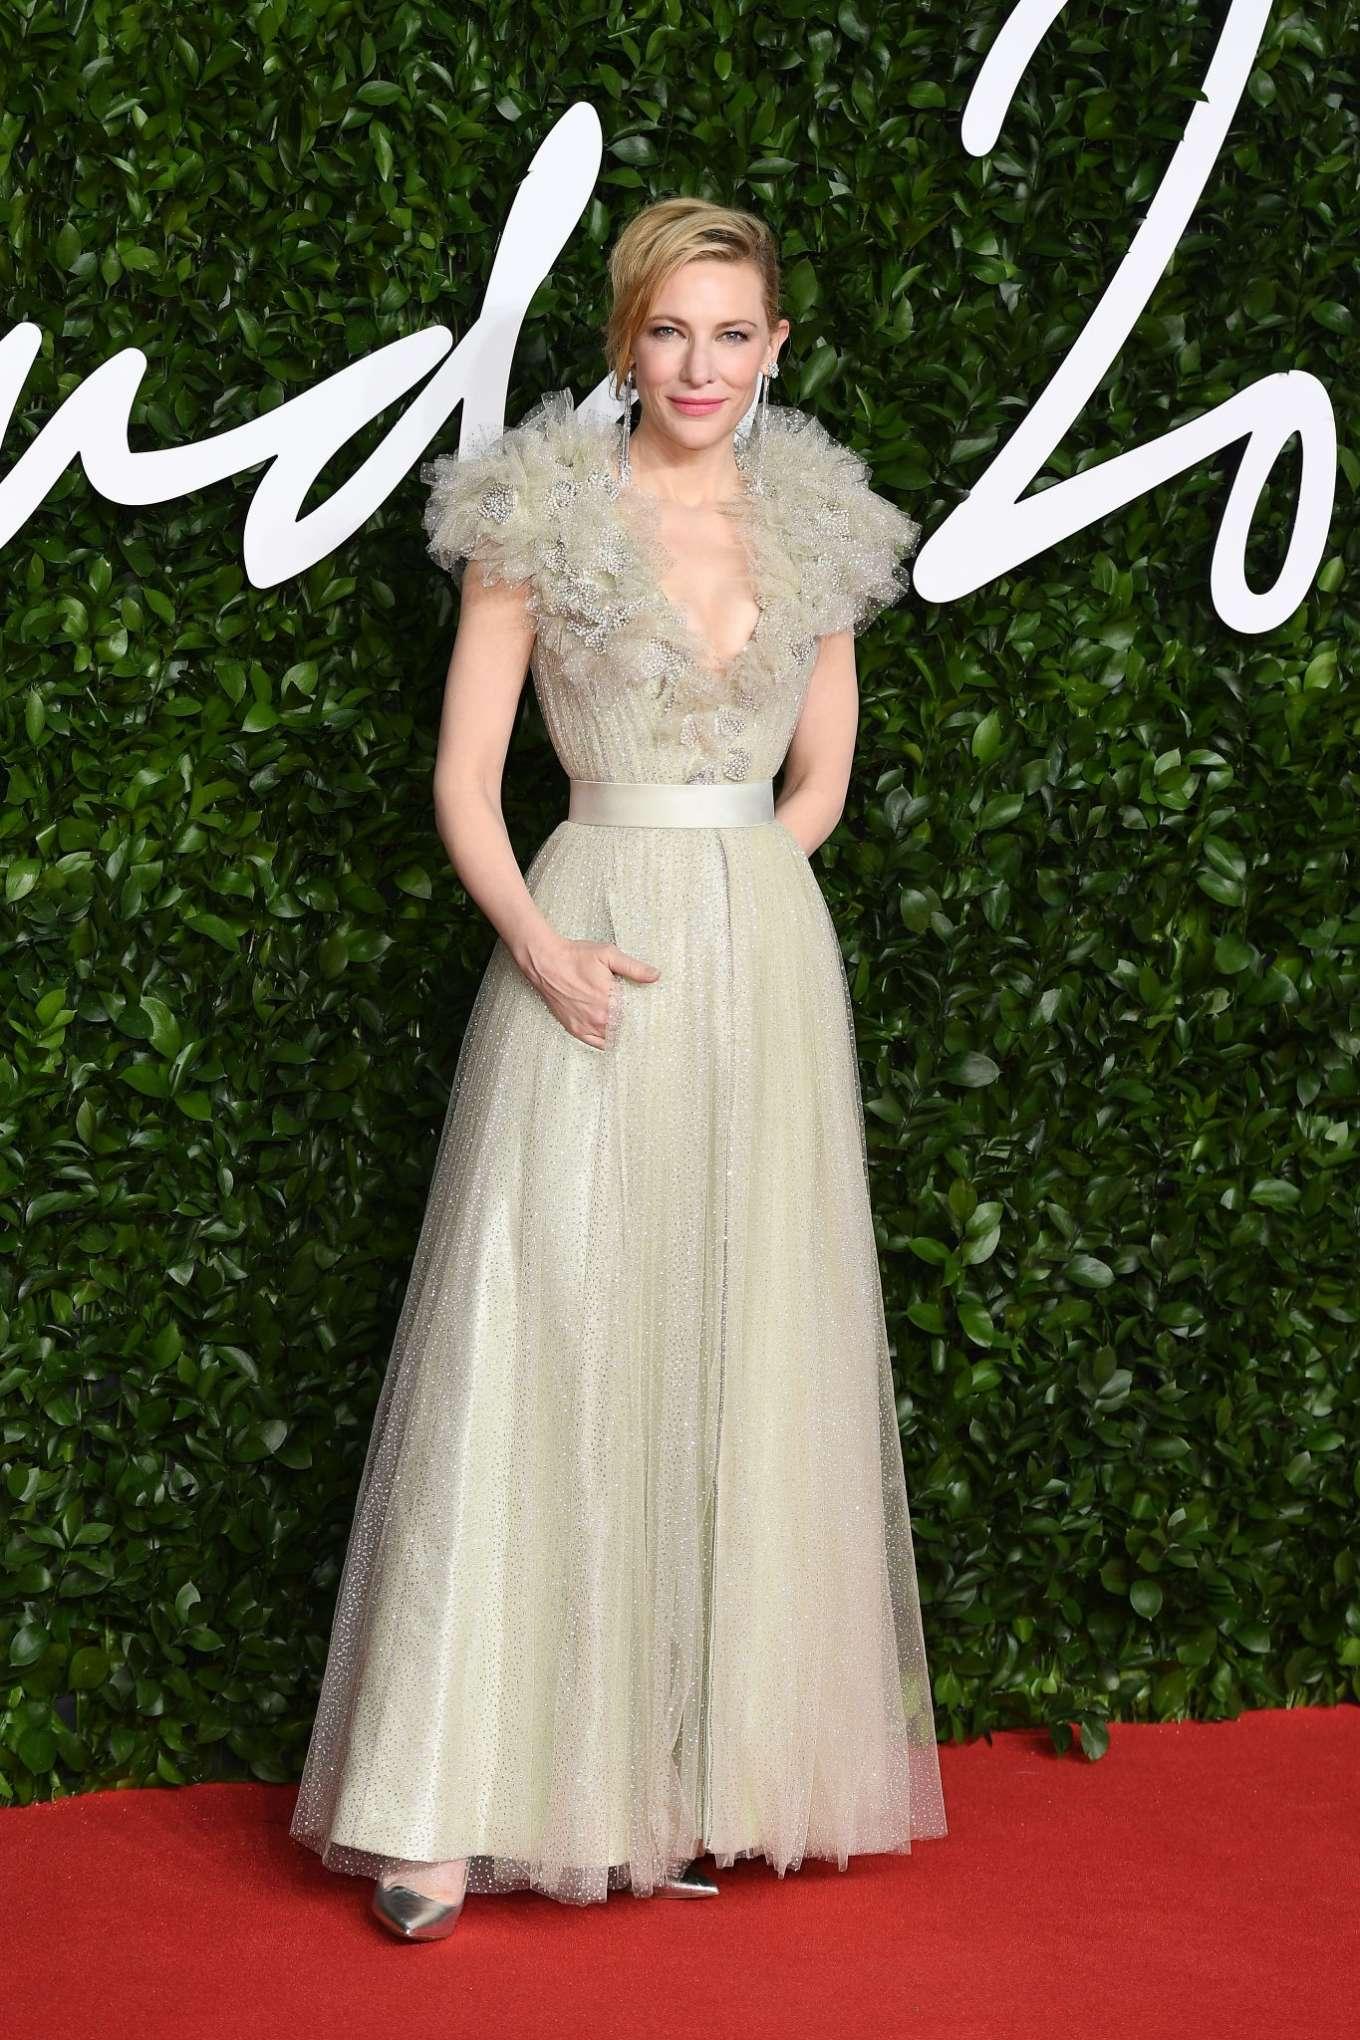 Cate Blanchett 2019 : Cate Blanchett – Fashion Awards 2019 in London-04